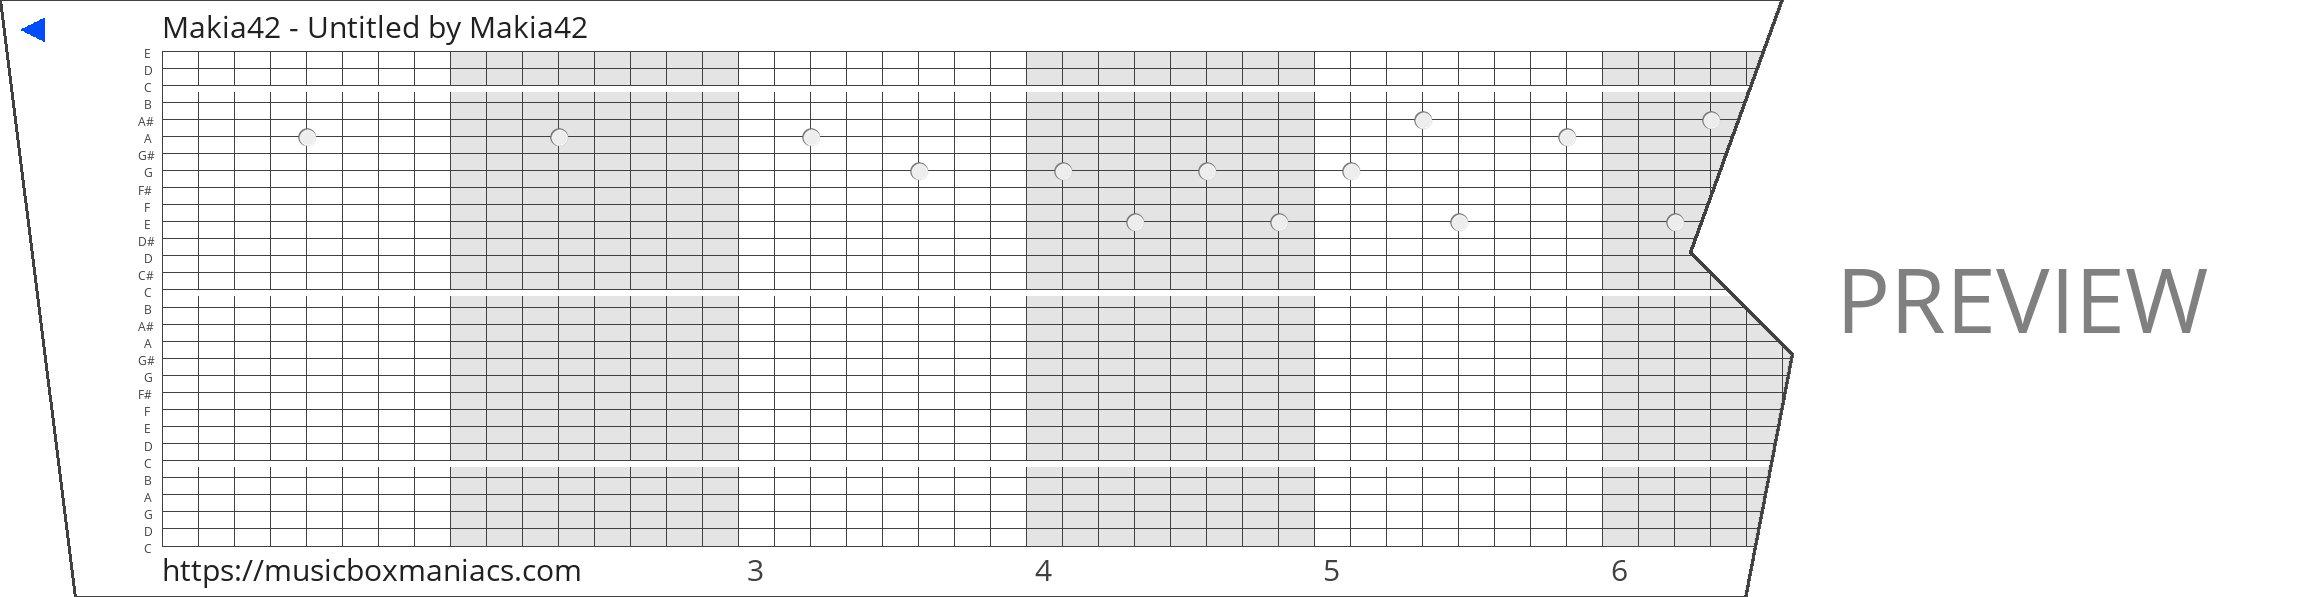 Makia42 - Untitled 30 note music box paper strip